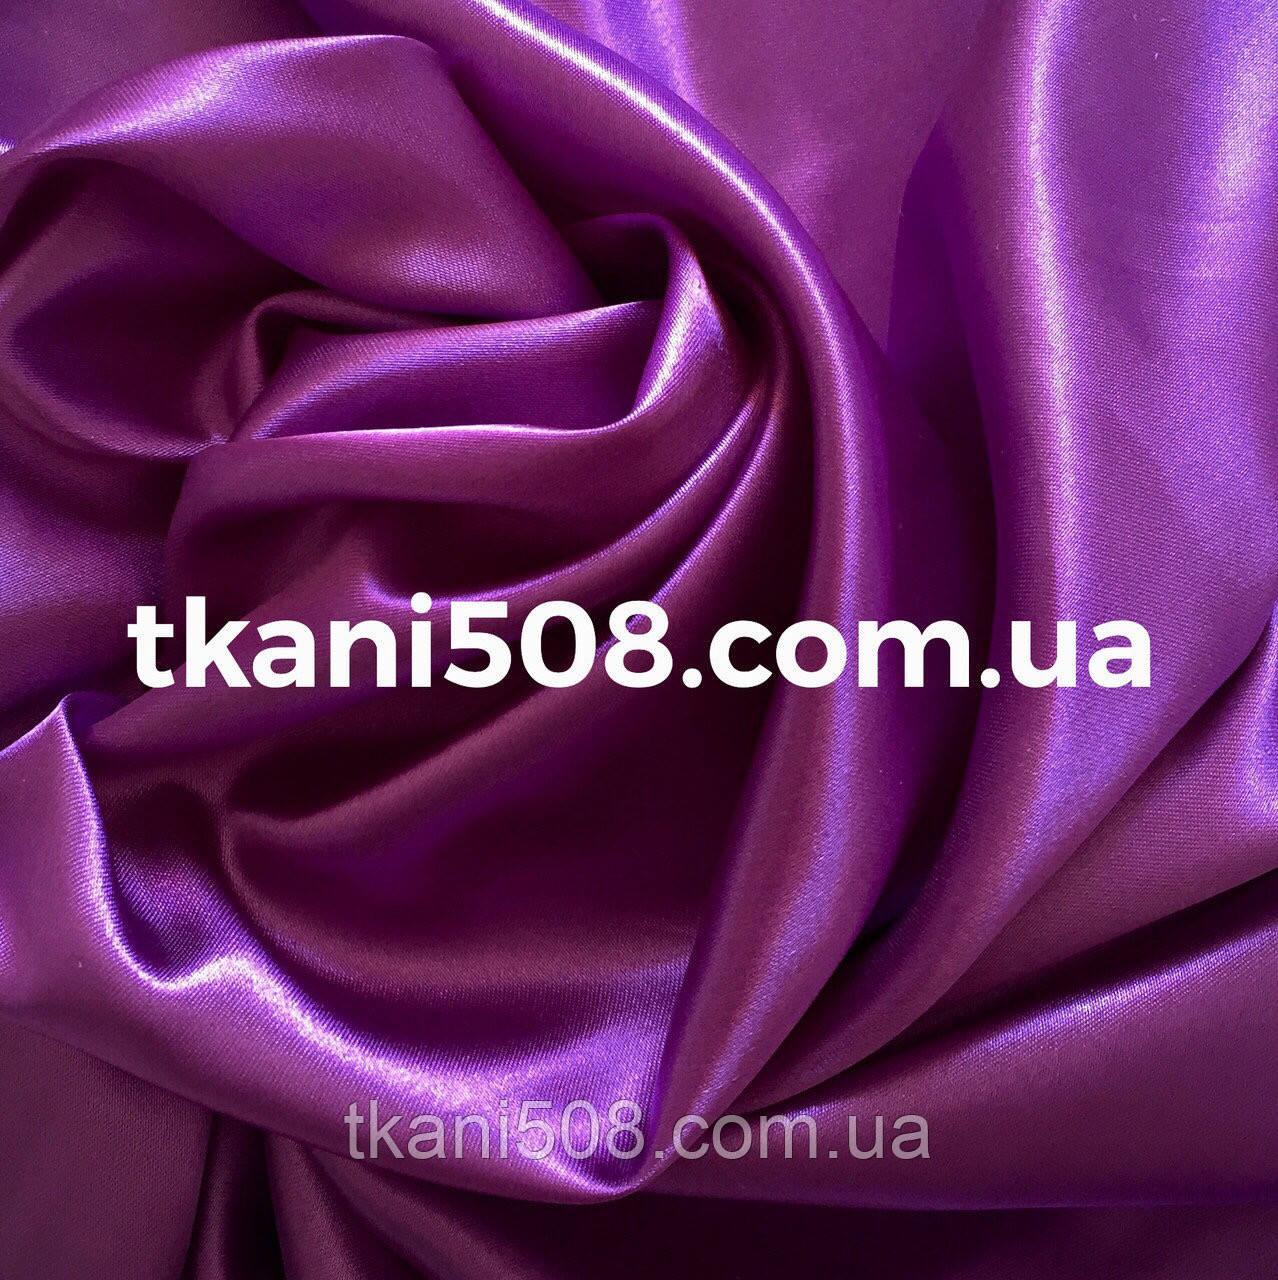 Ткань Атлас Фиолетовый (30)